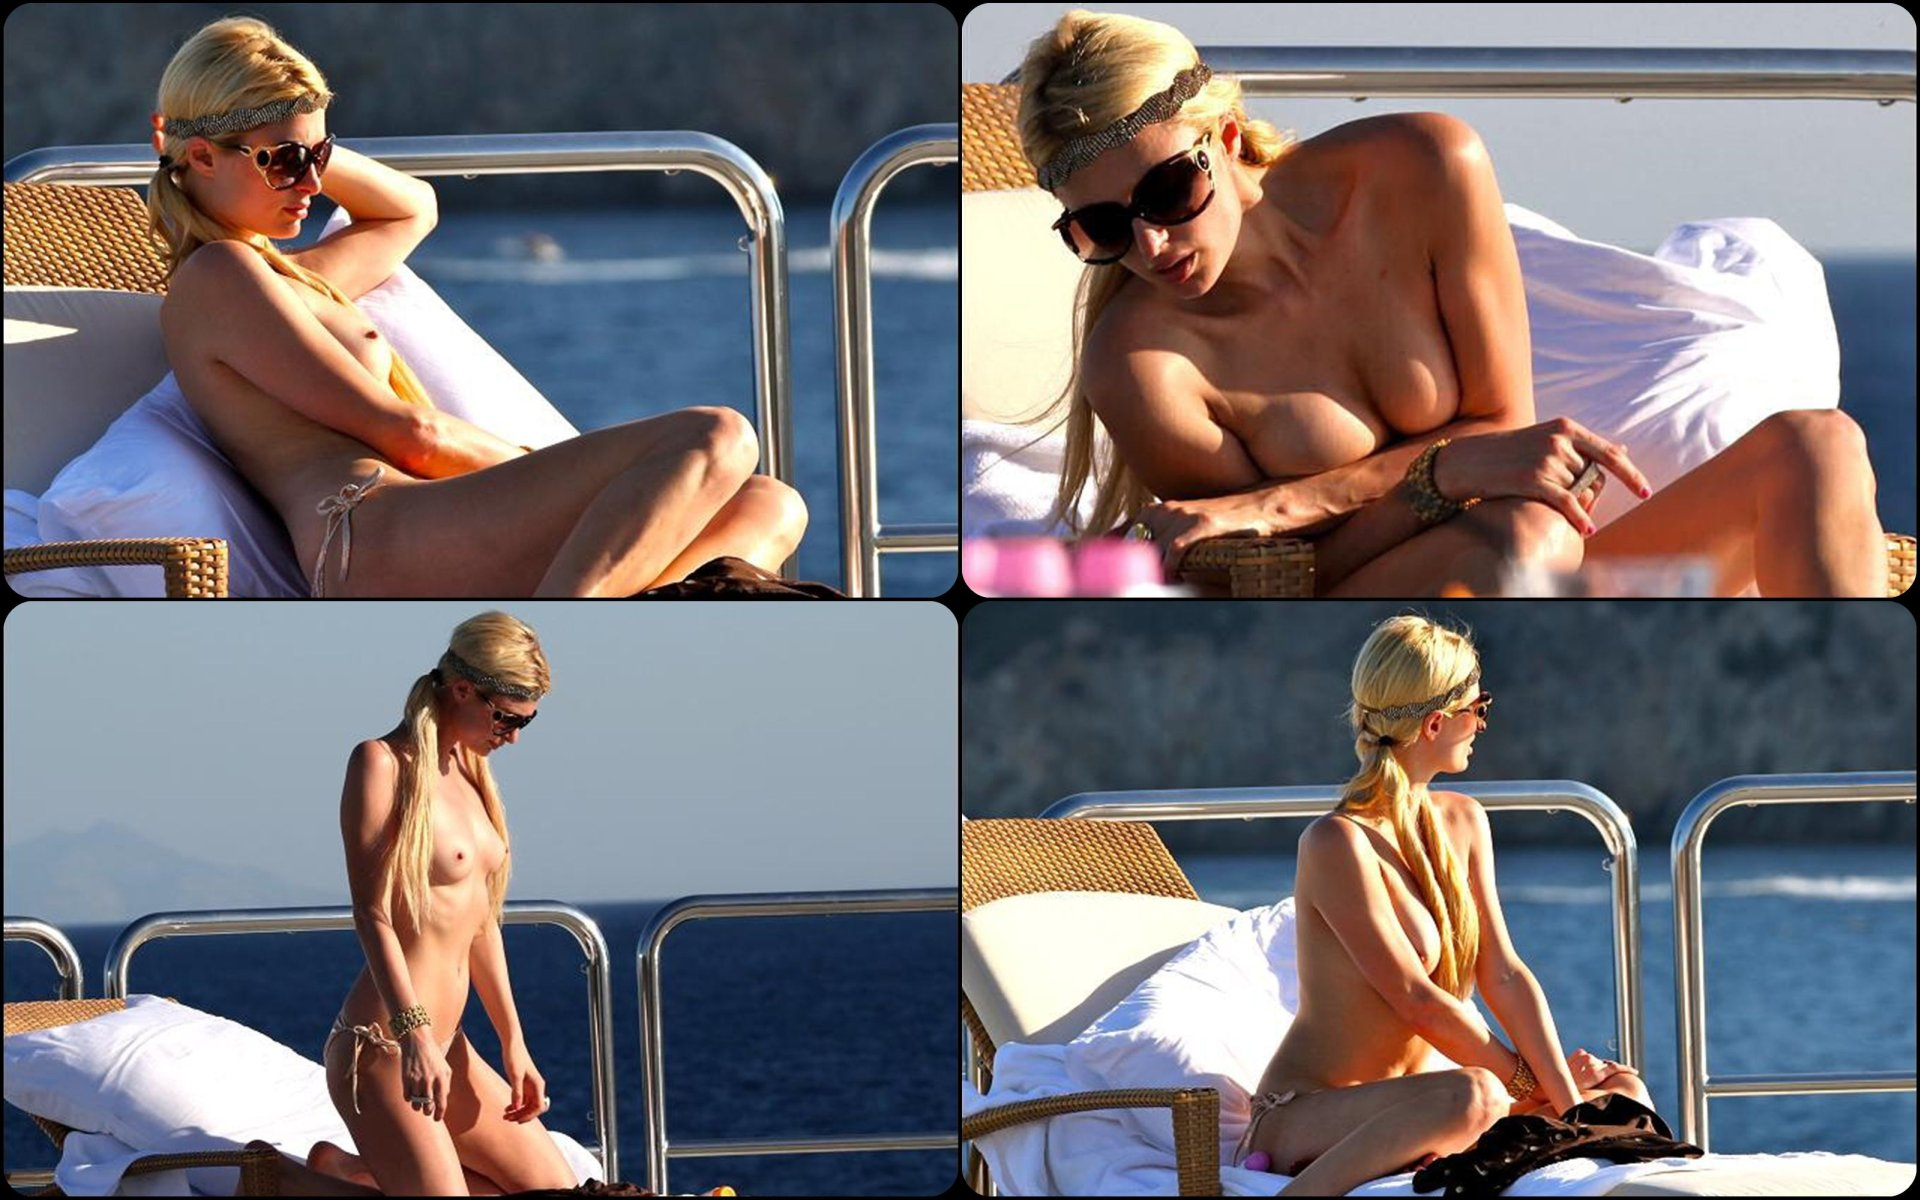 Nude Paris Hilton Kisses Girl